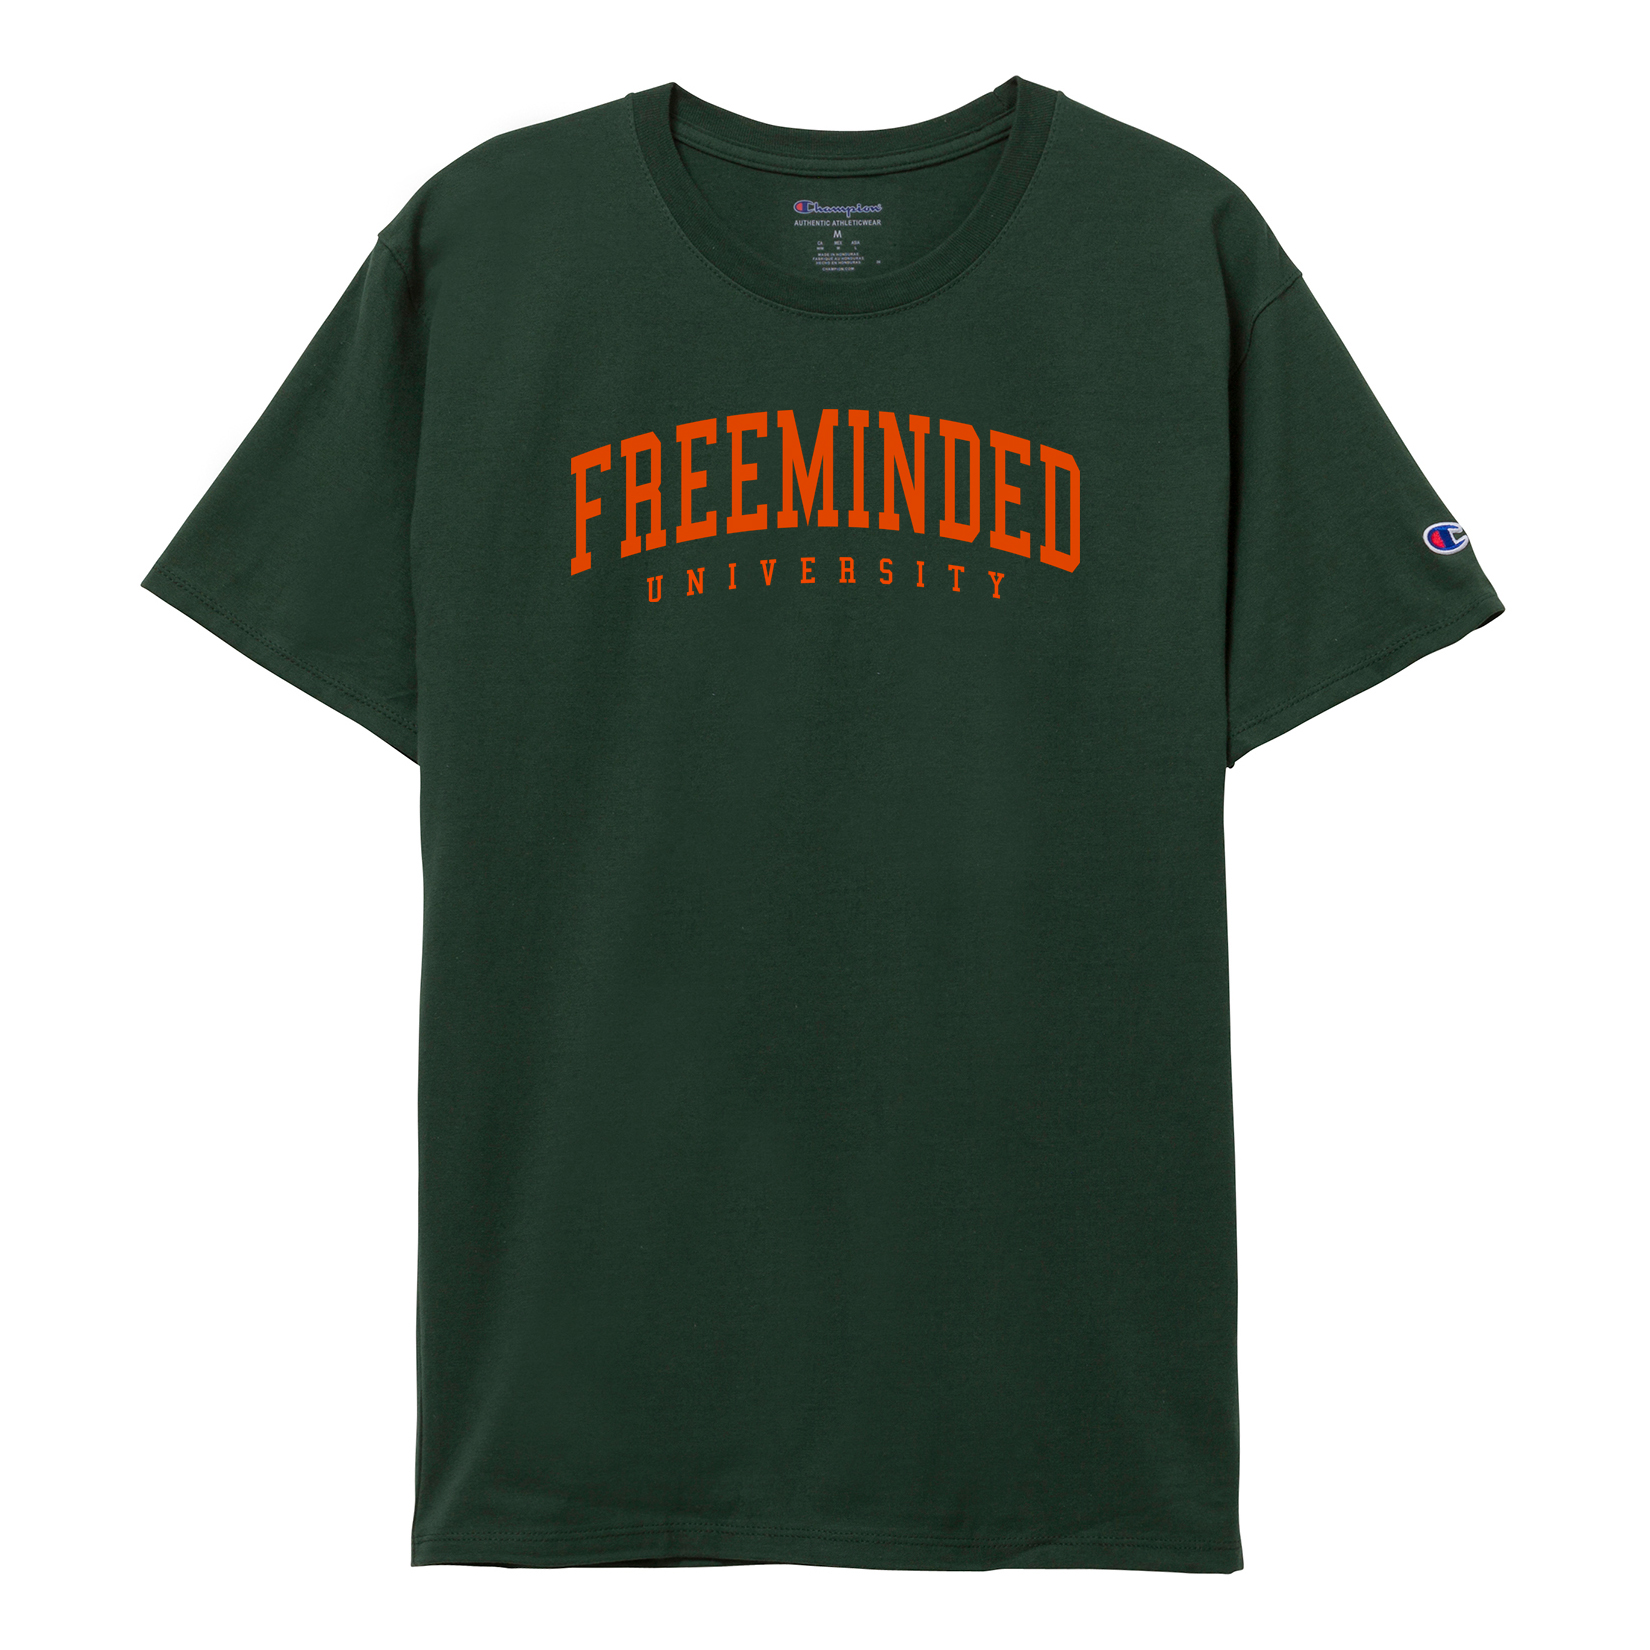 Freeminded University Tee [Dark Green]